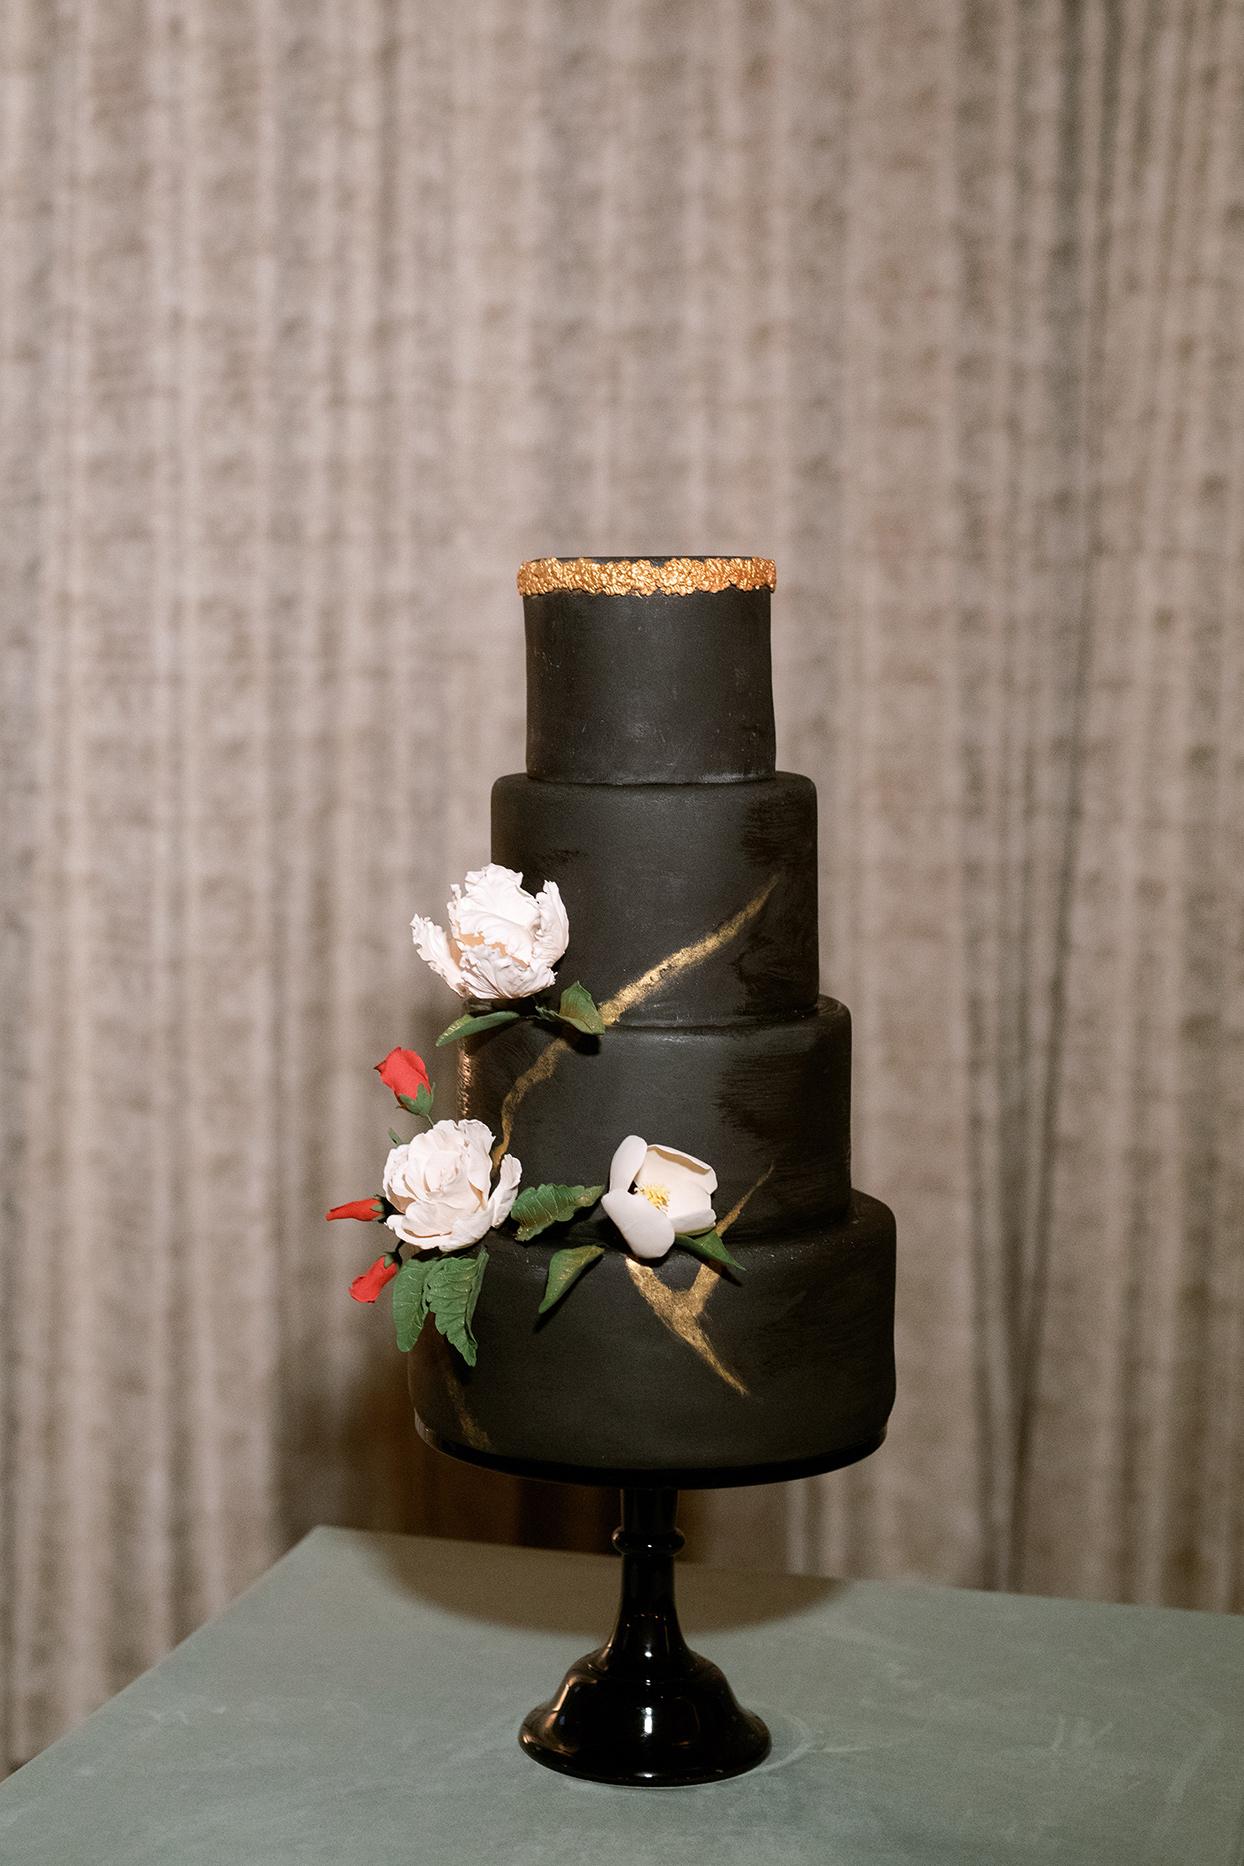 jason justin wedding black cake with flowers